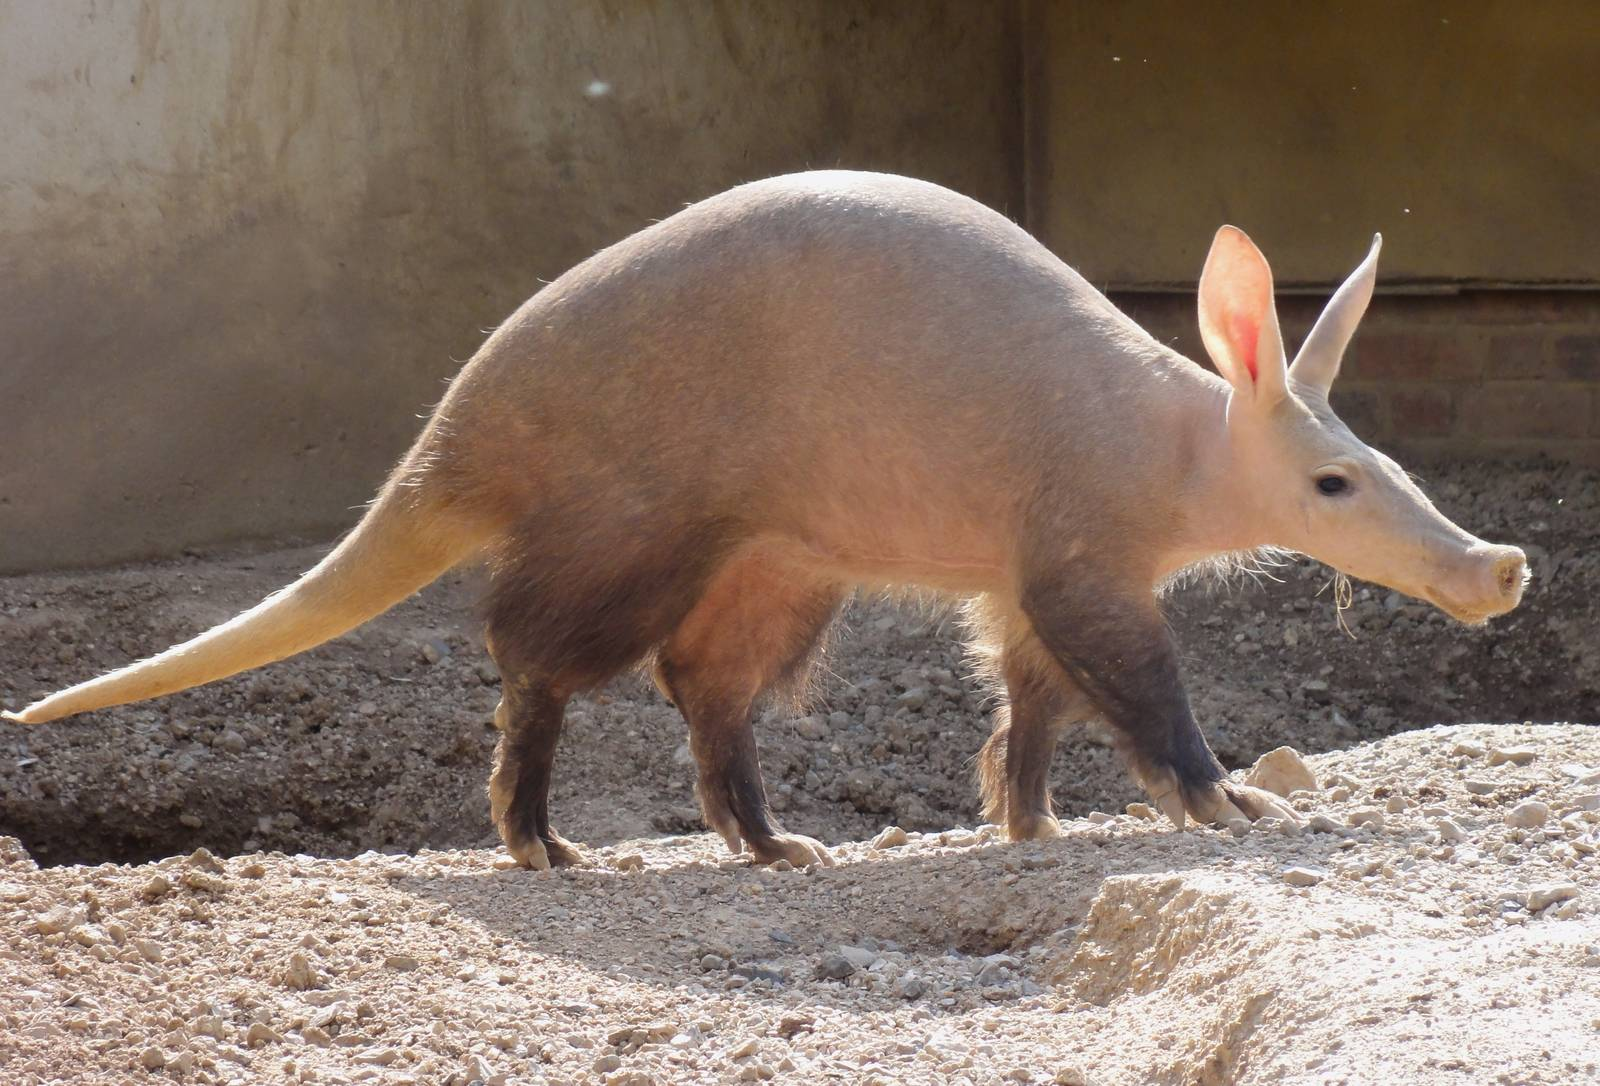 Aardvark animal pictures